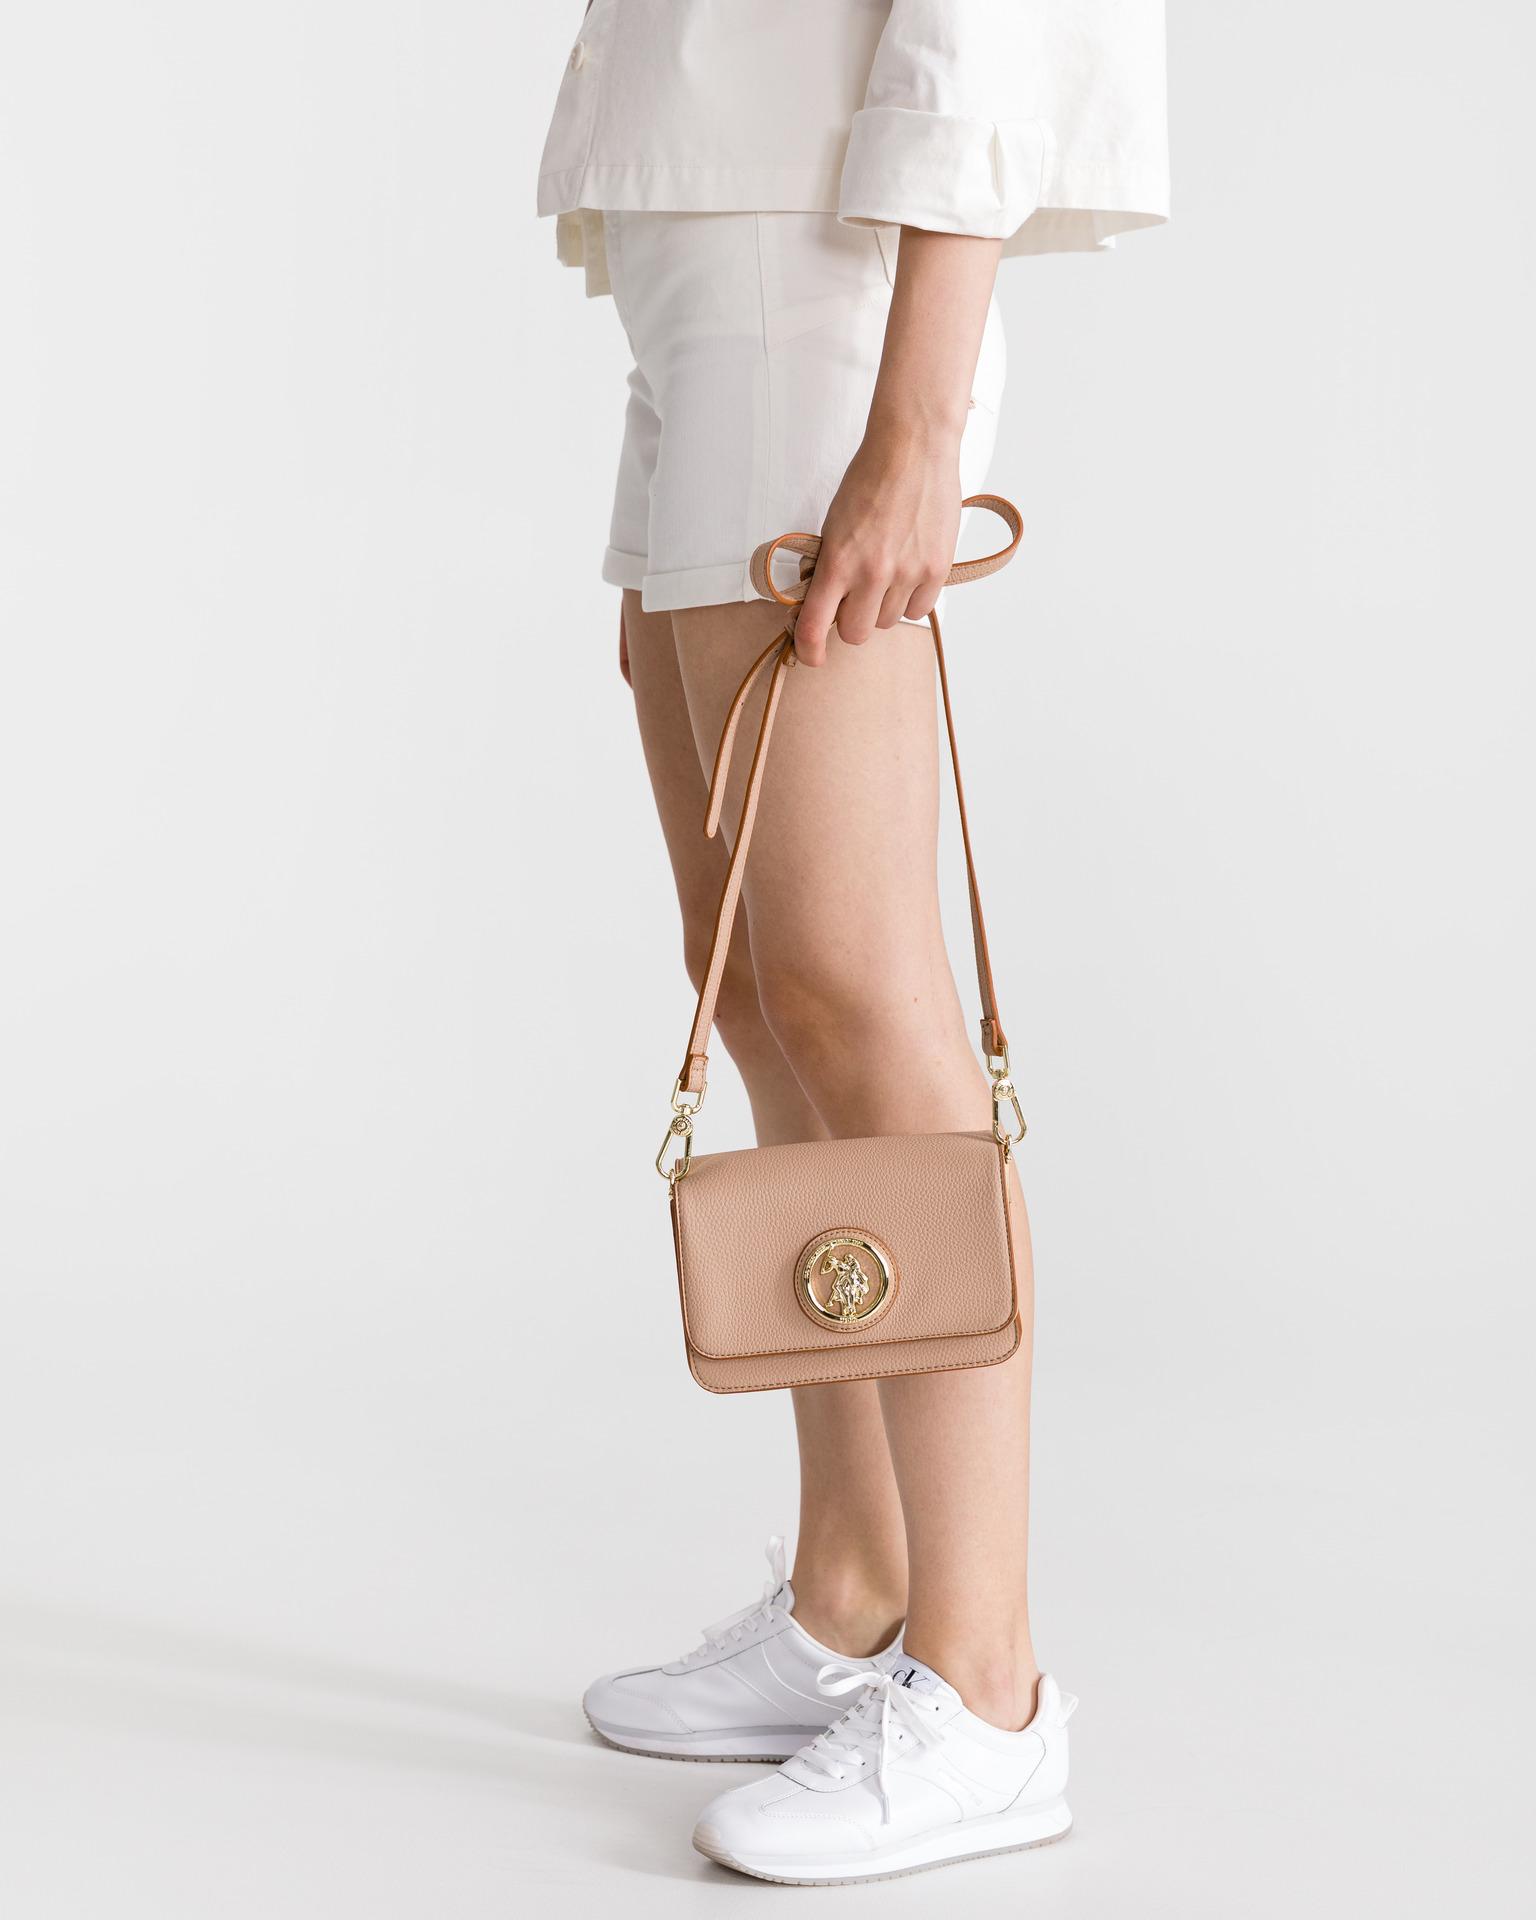 U.S. Polo Assn. Borsetta donna marrone  U.S.